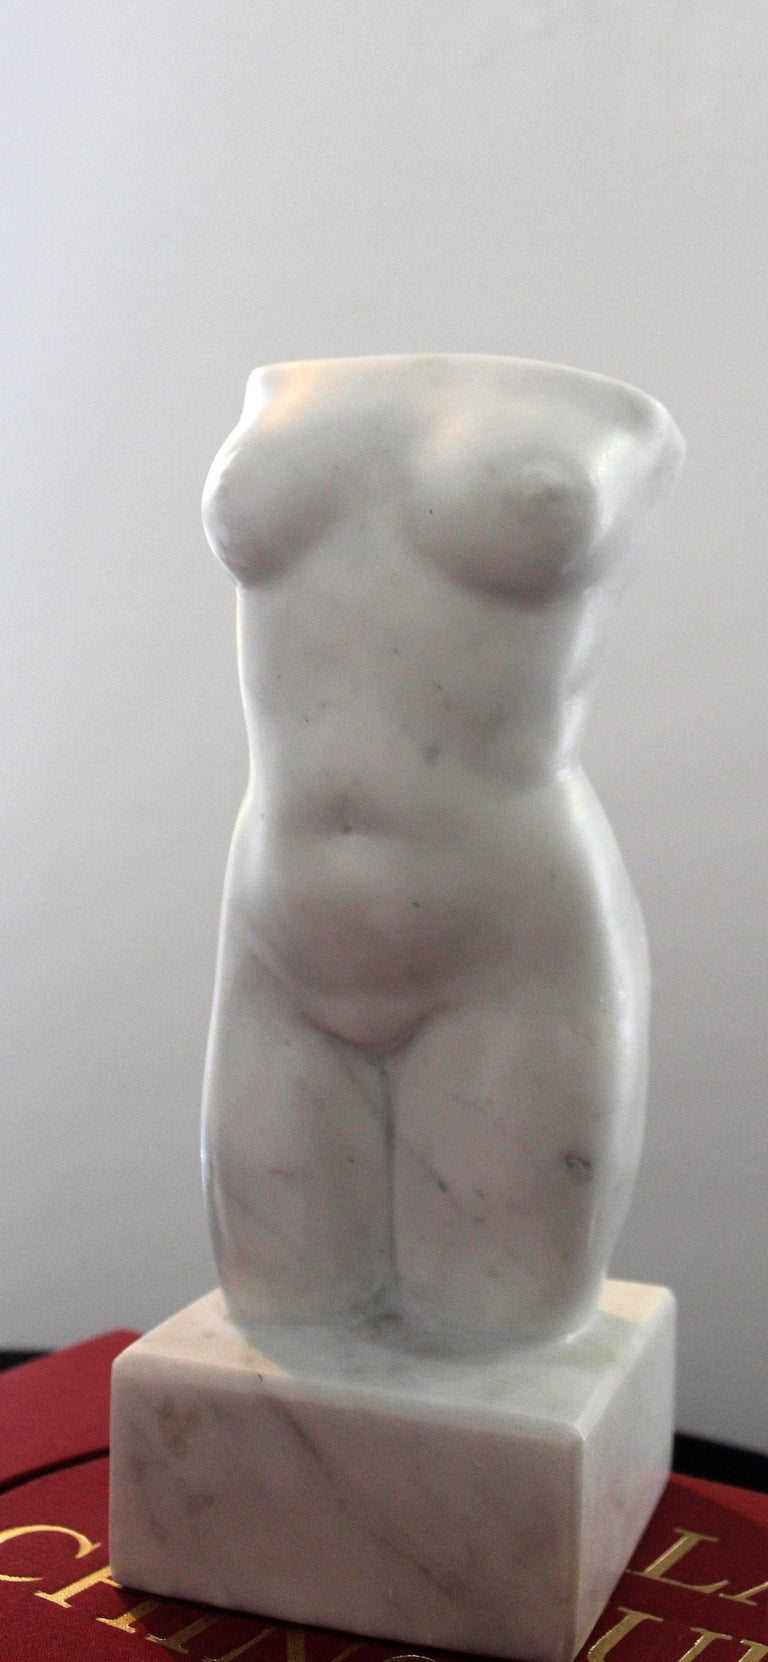 Nude - XXI century, Marble figurative sculpture, Classical - Sculpture by Ryszard Piotrowski